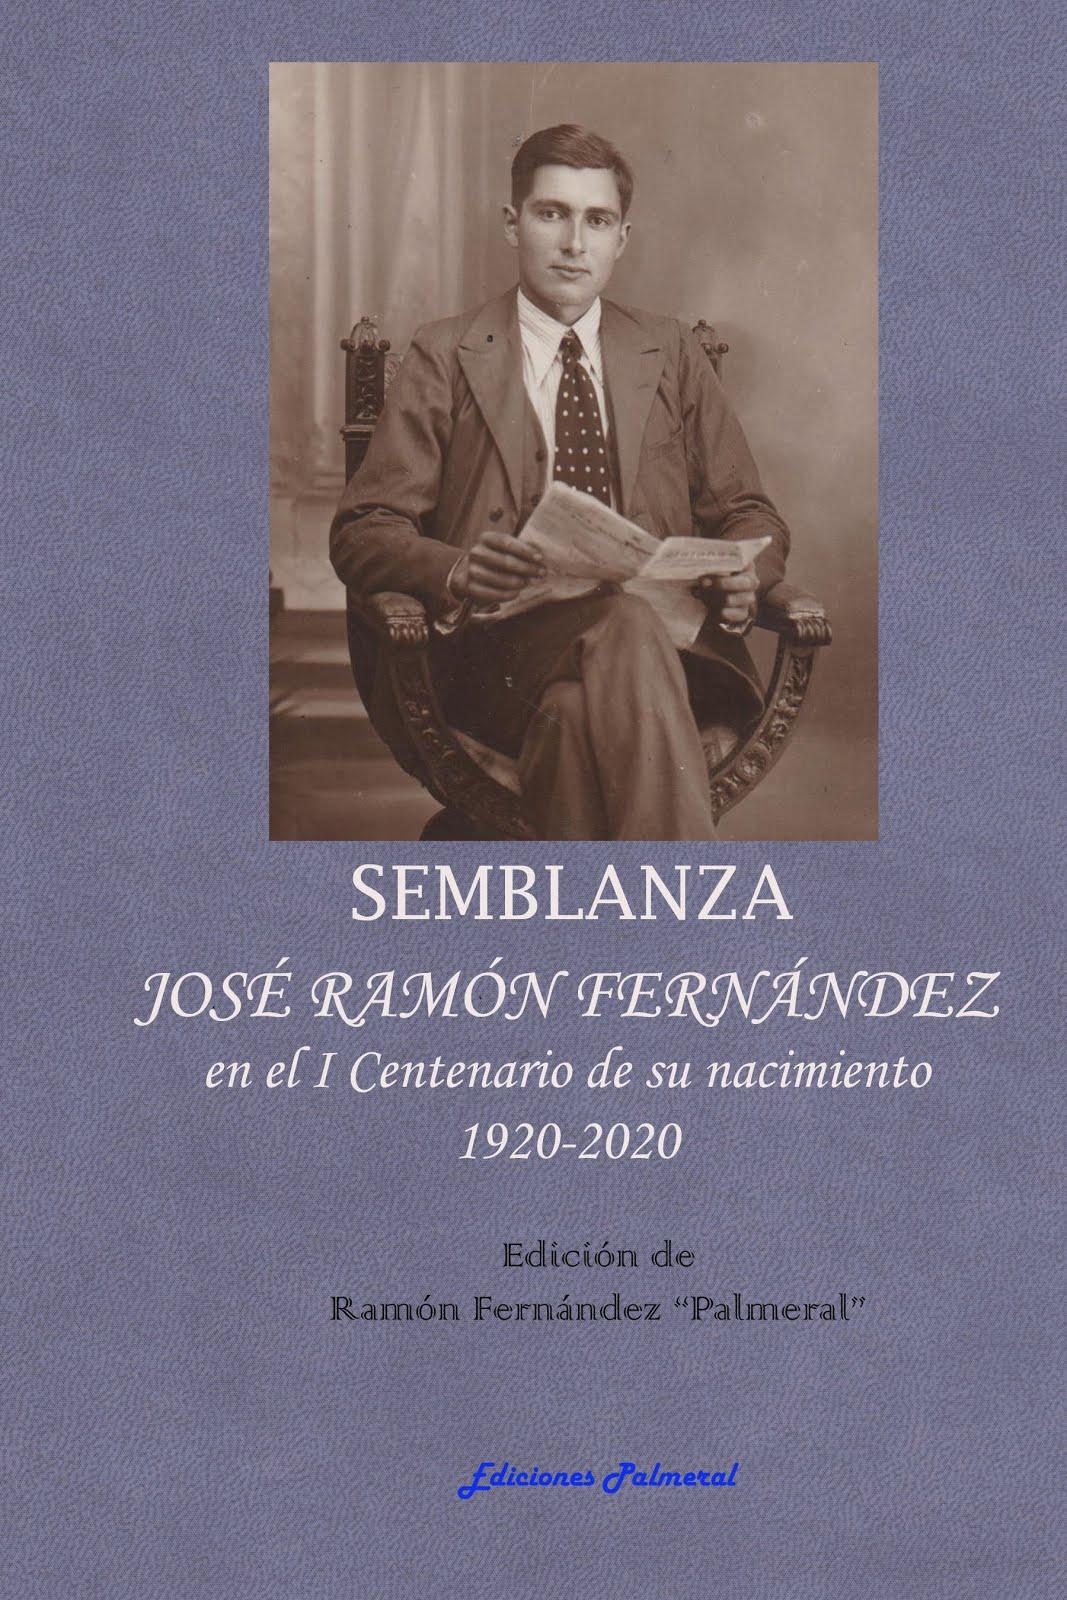 Semblanza de José Ramón Fernández